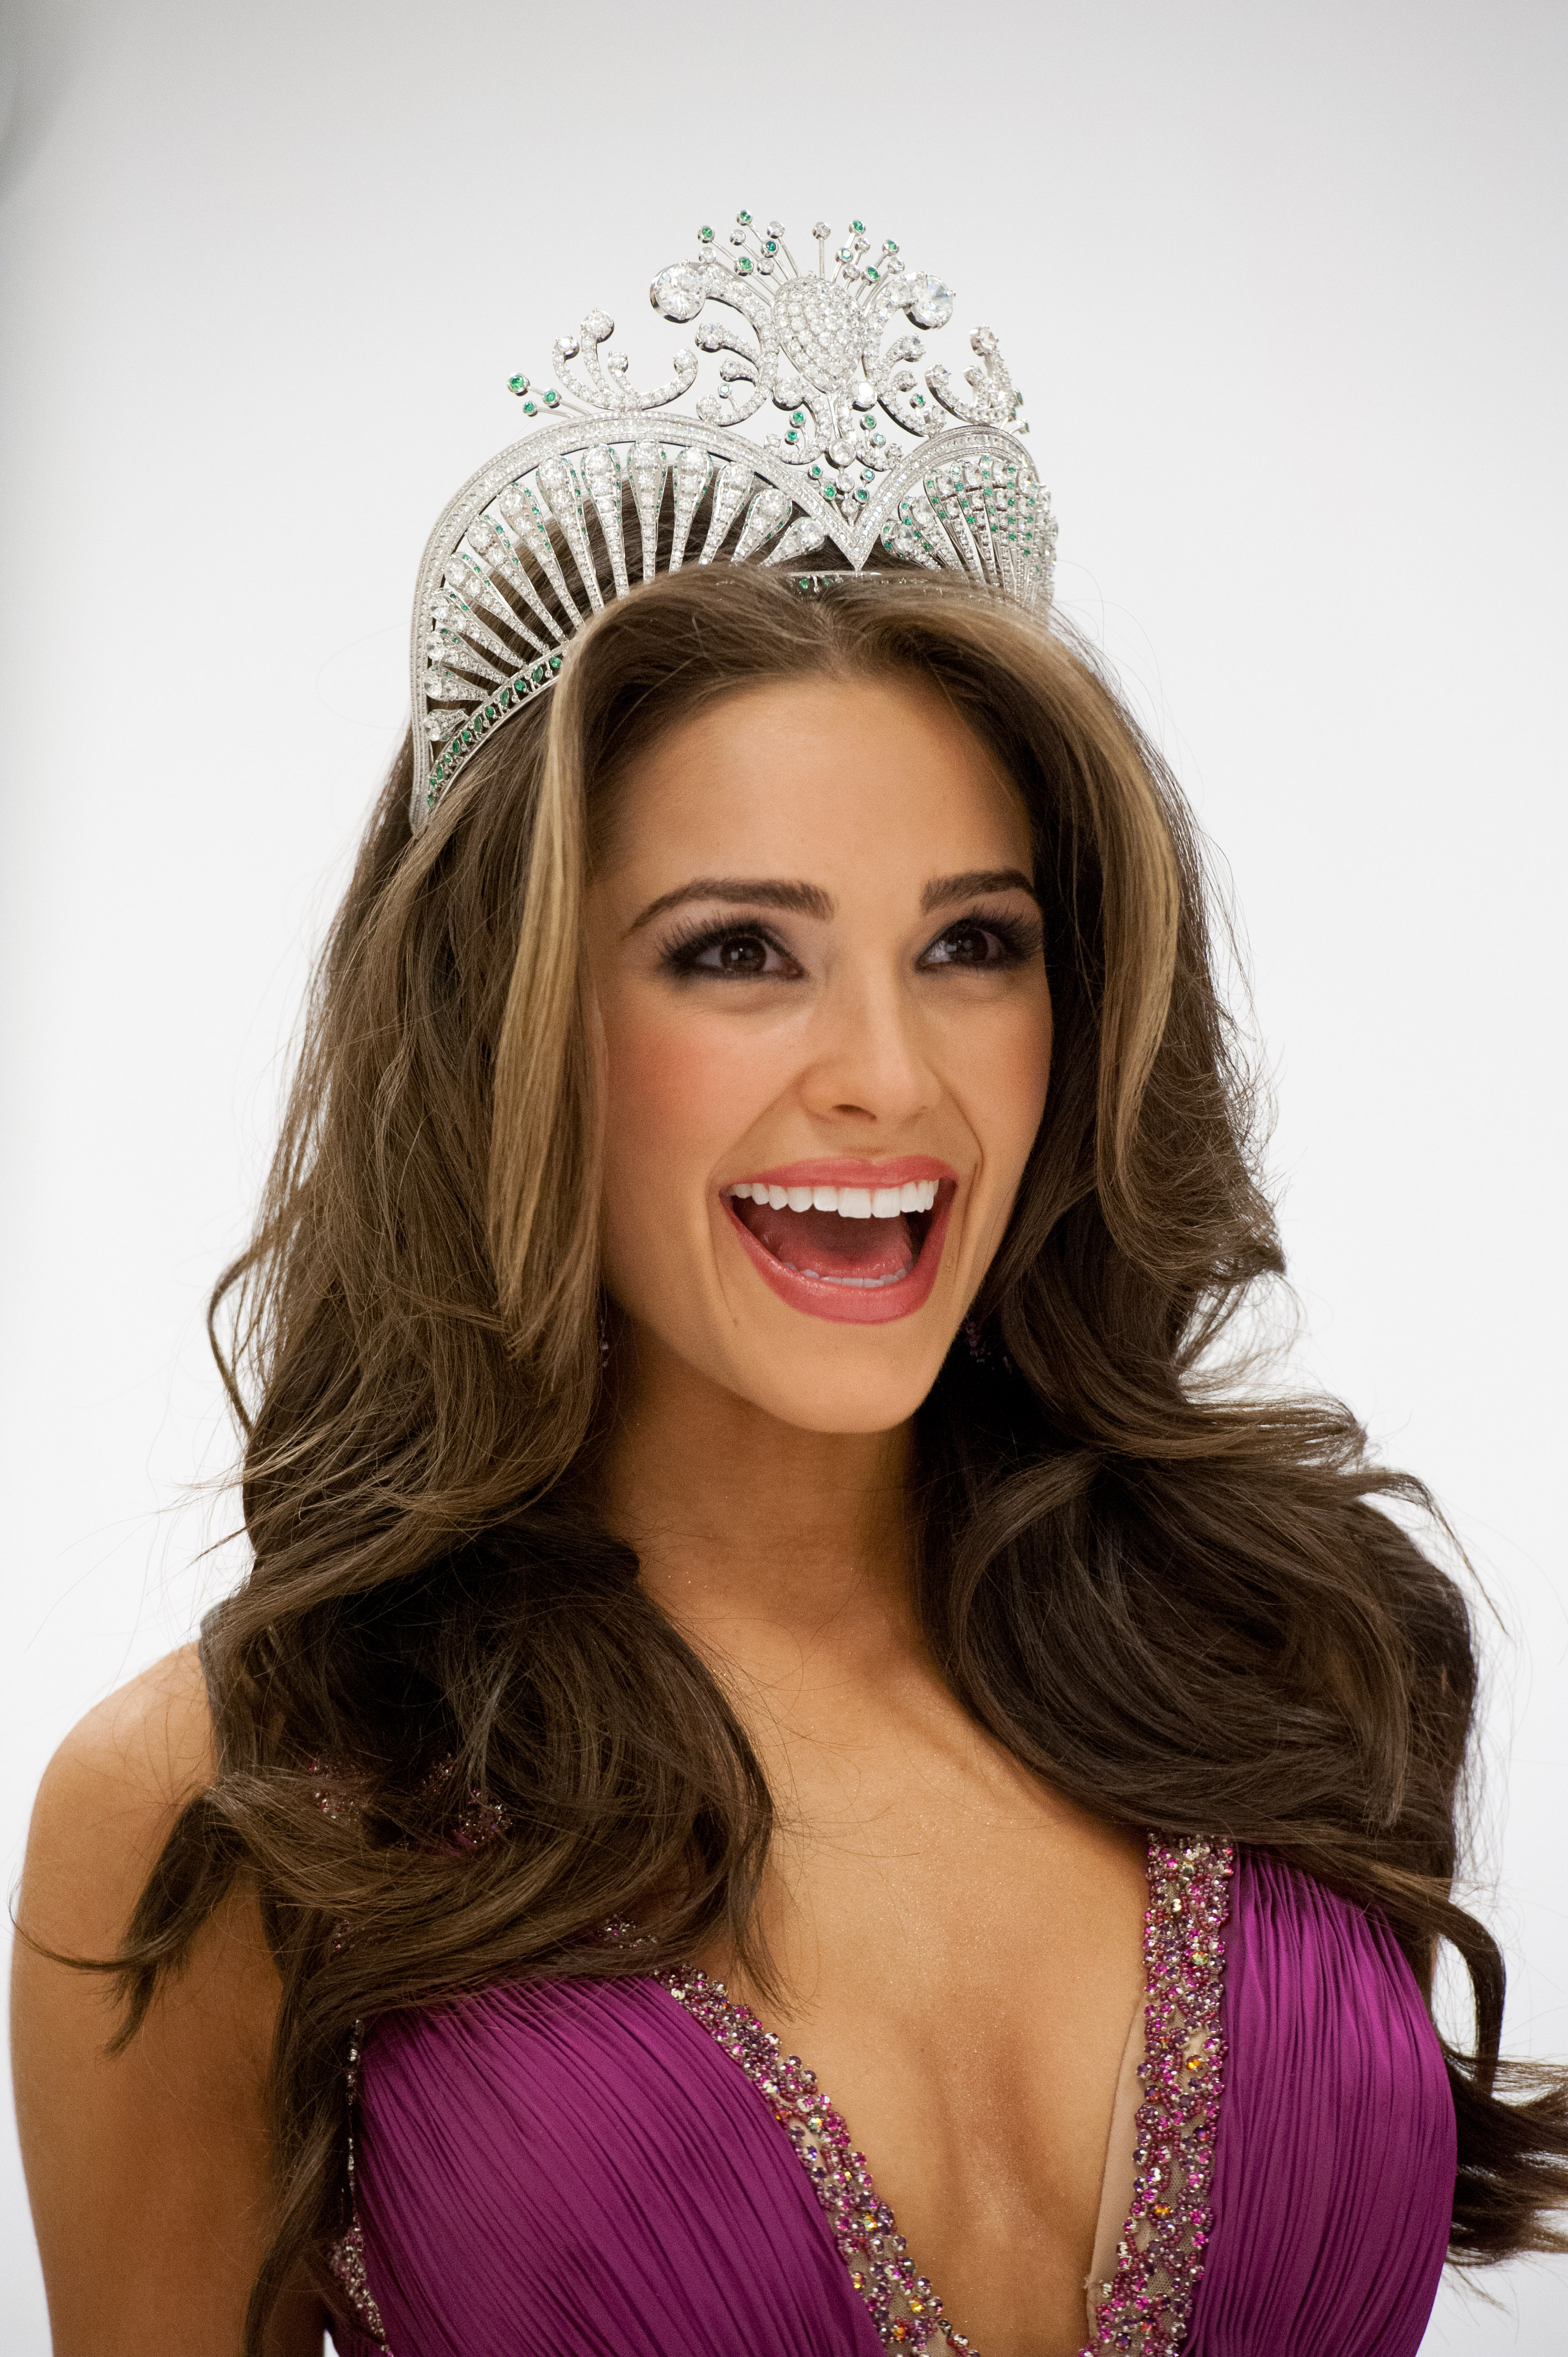 Olivia Culpo: Miss Universe